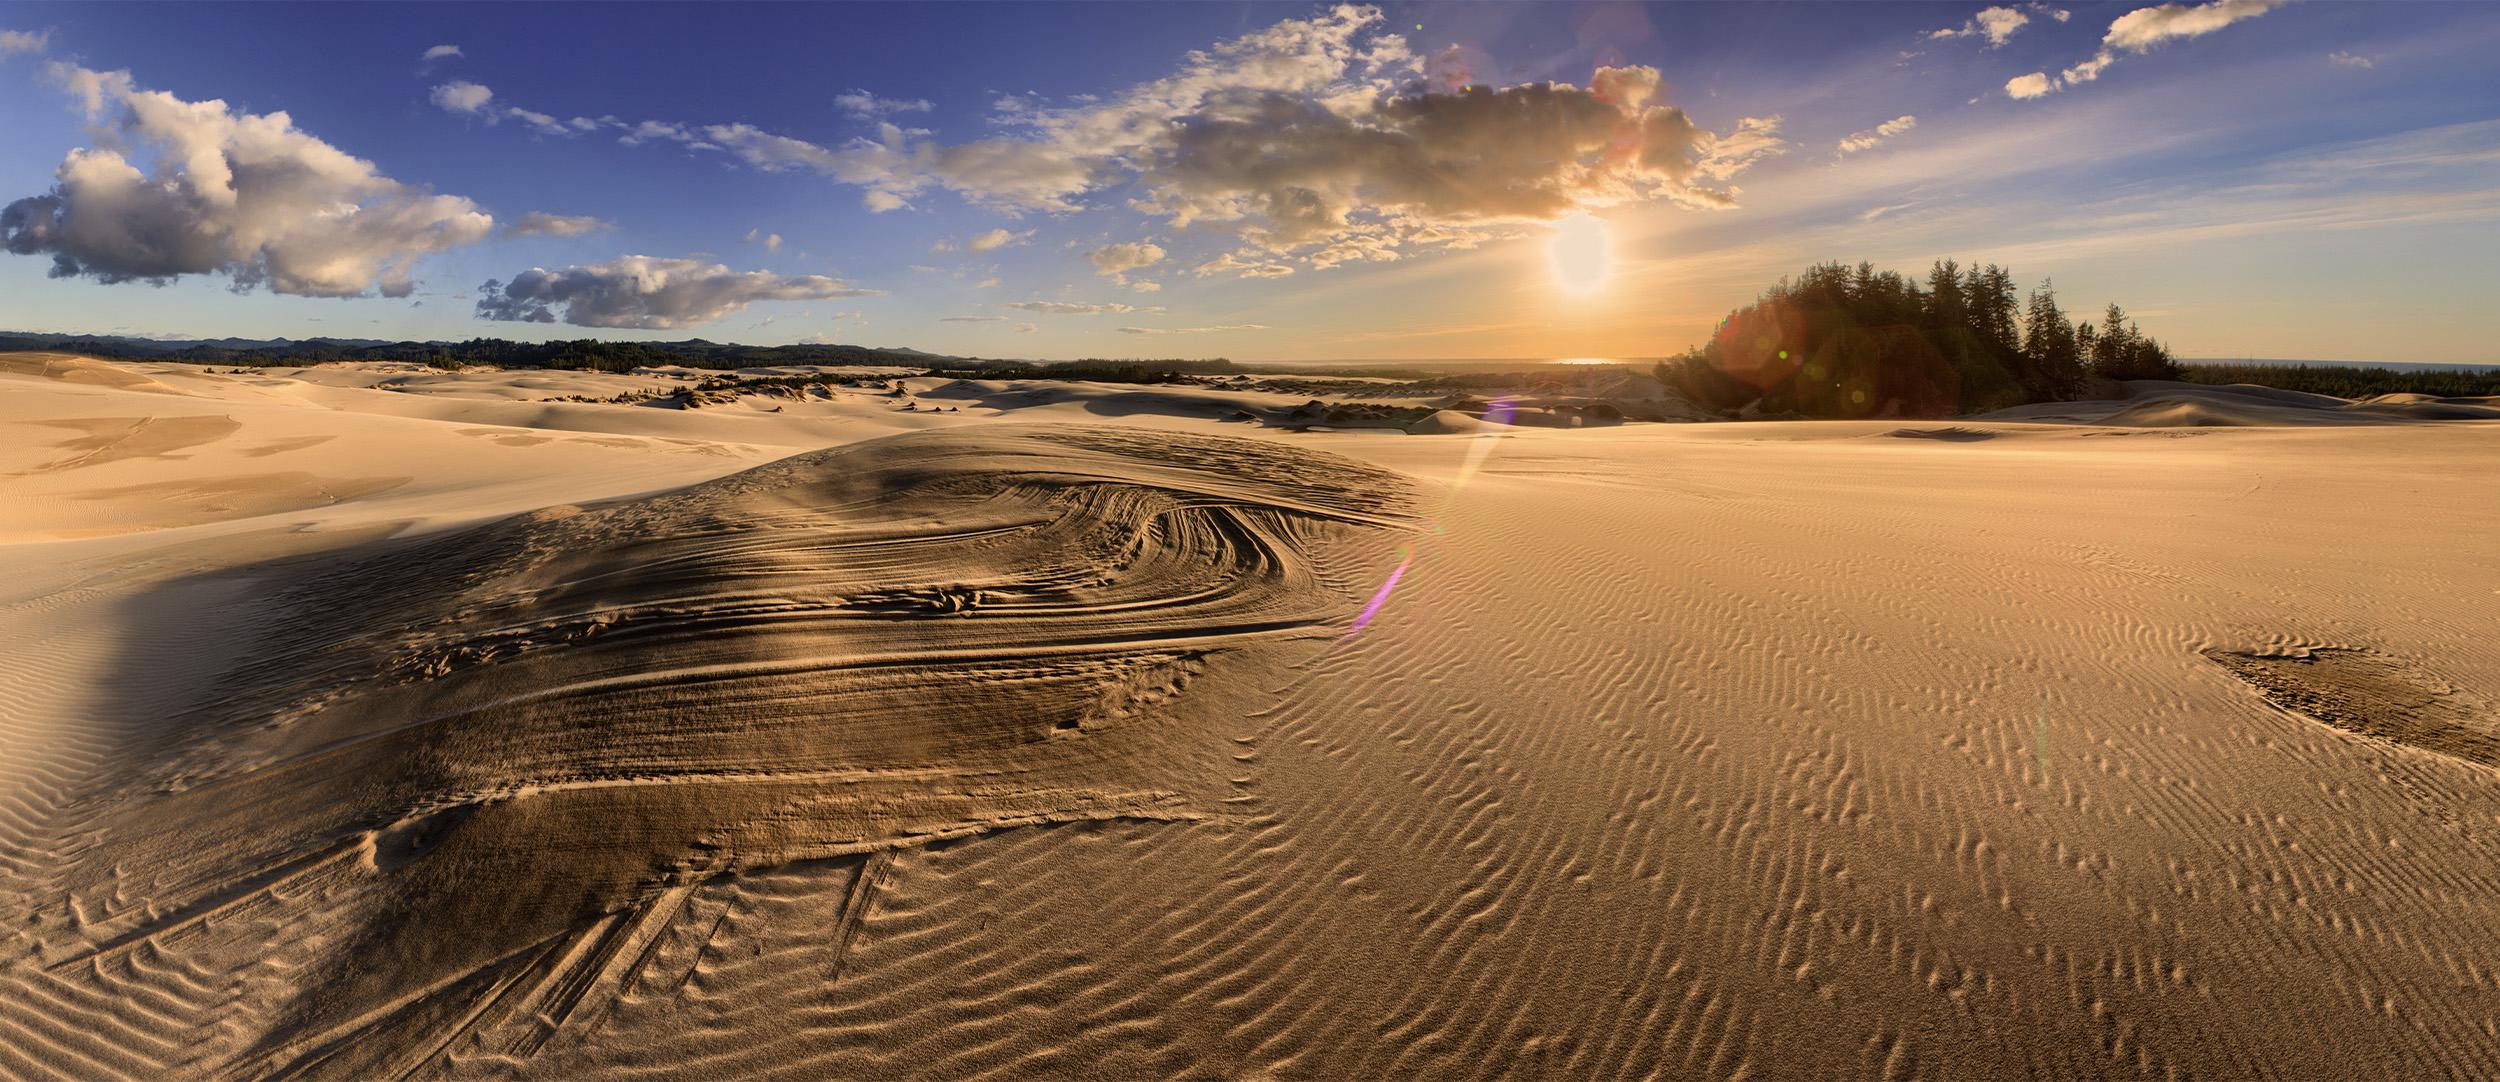 Dellenback Dunes #13